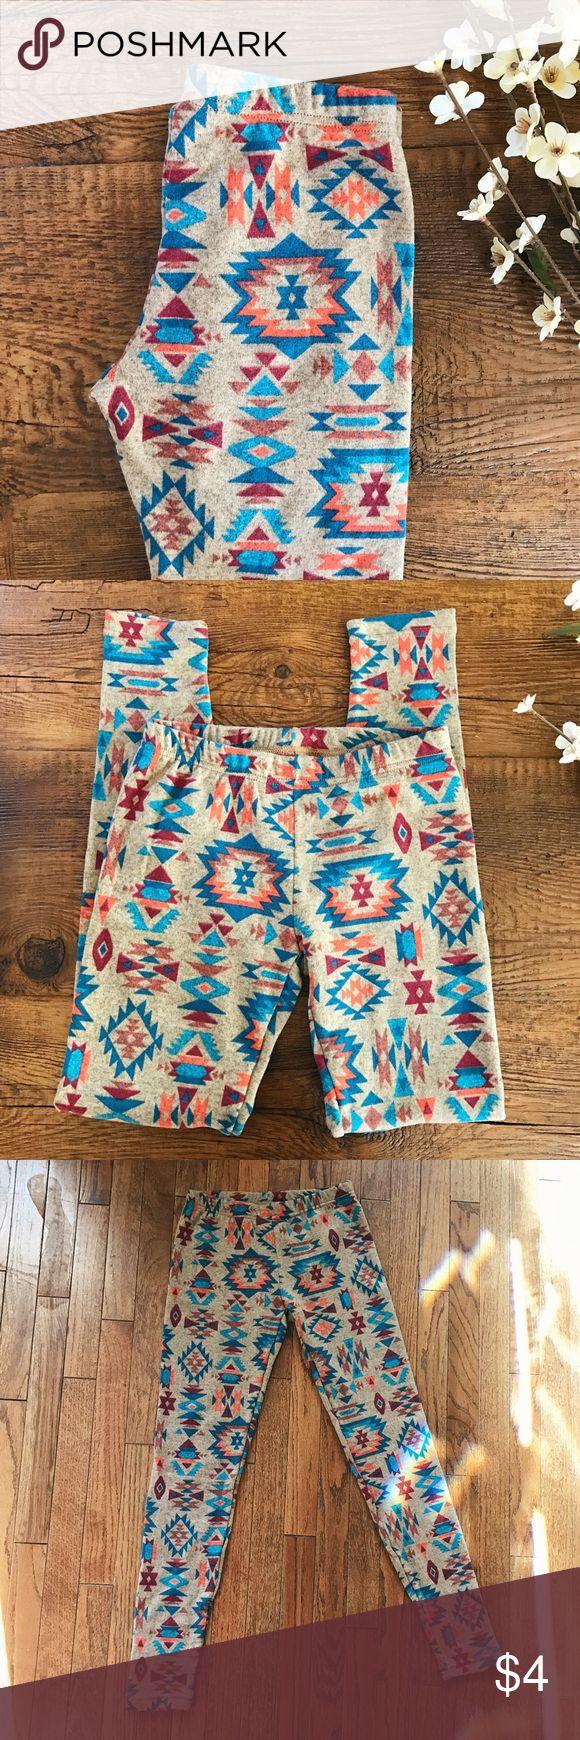 No Boundaries Tribal Print Legging No Boundaries Tribal Print Legging. New With tags, never worn. They are a size medium (7-9),95% polyester, 5% spandex. No Boundaries Pants Leggings